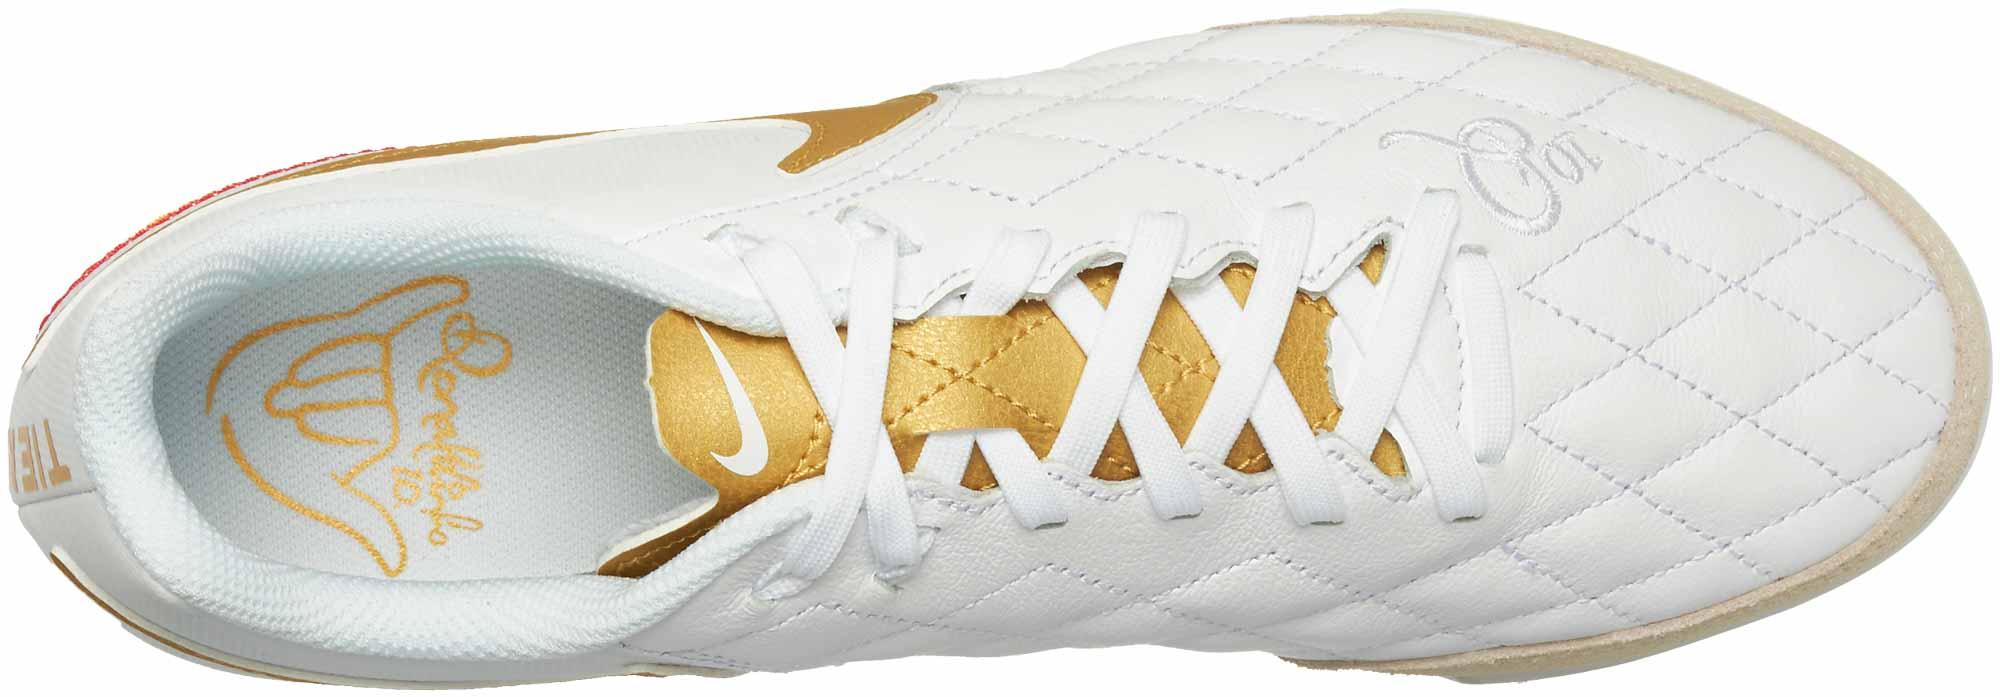 various colors 8b64c 79cec Nike LegendX 7 Academy IC - 10R - White/Metallic Gold ...